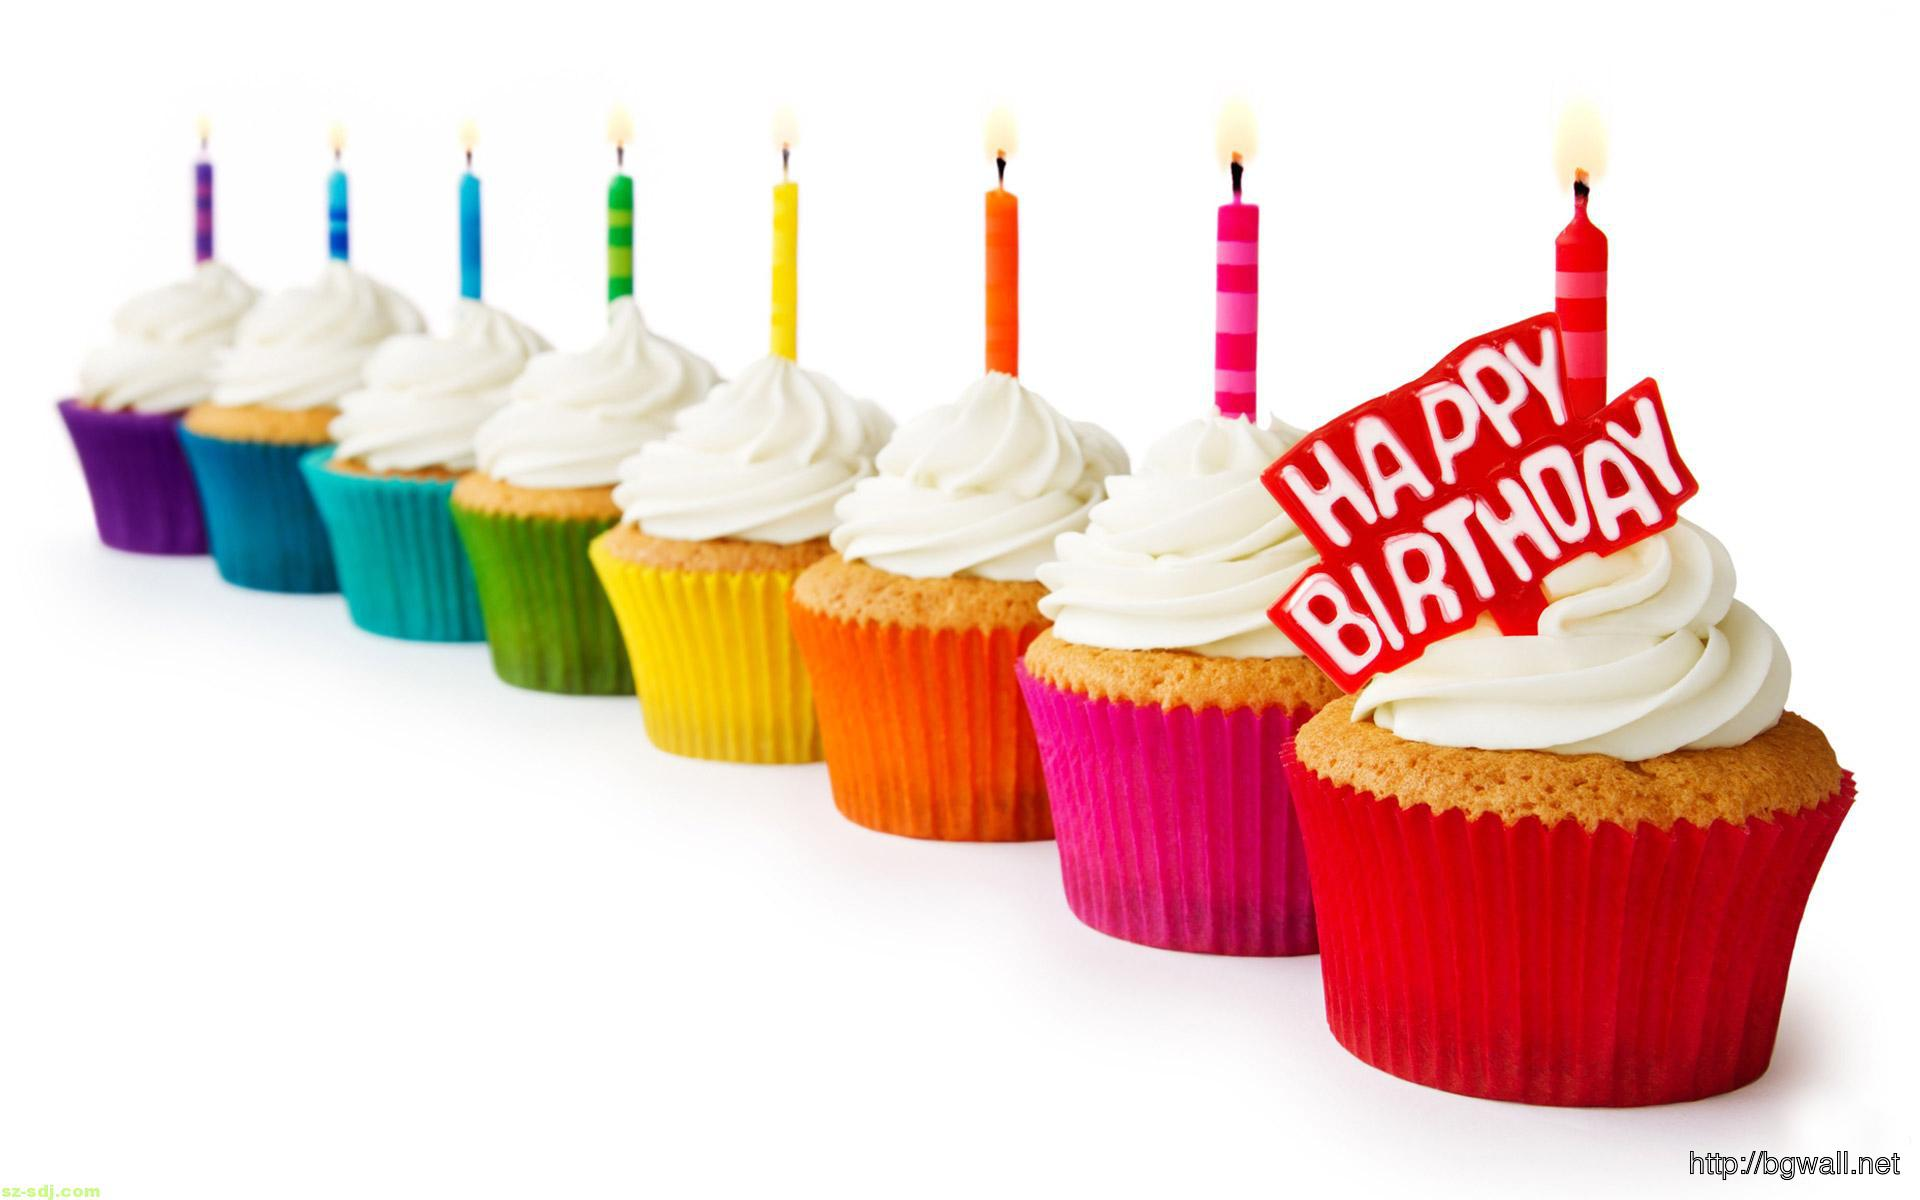 Happy Birthday Cake Image Wallpaper Computer1 – Background